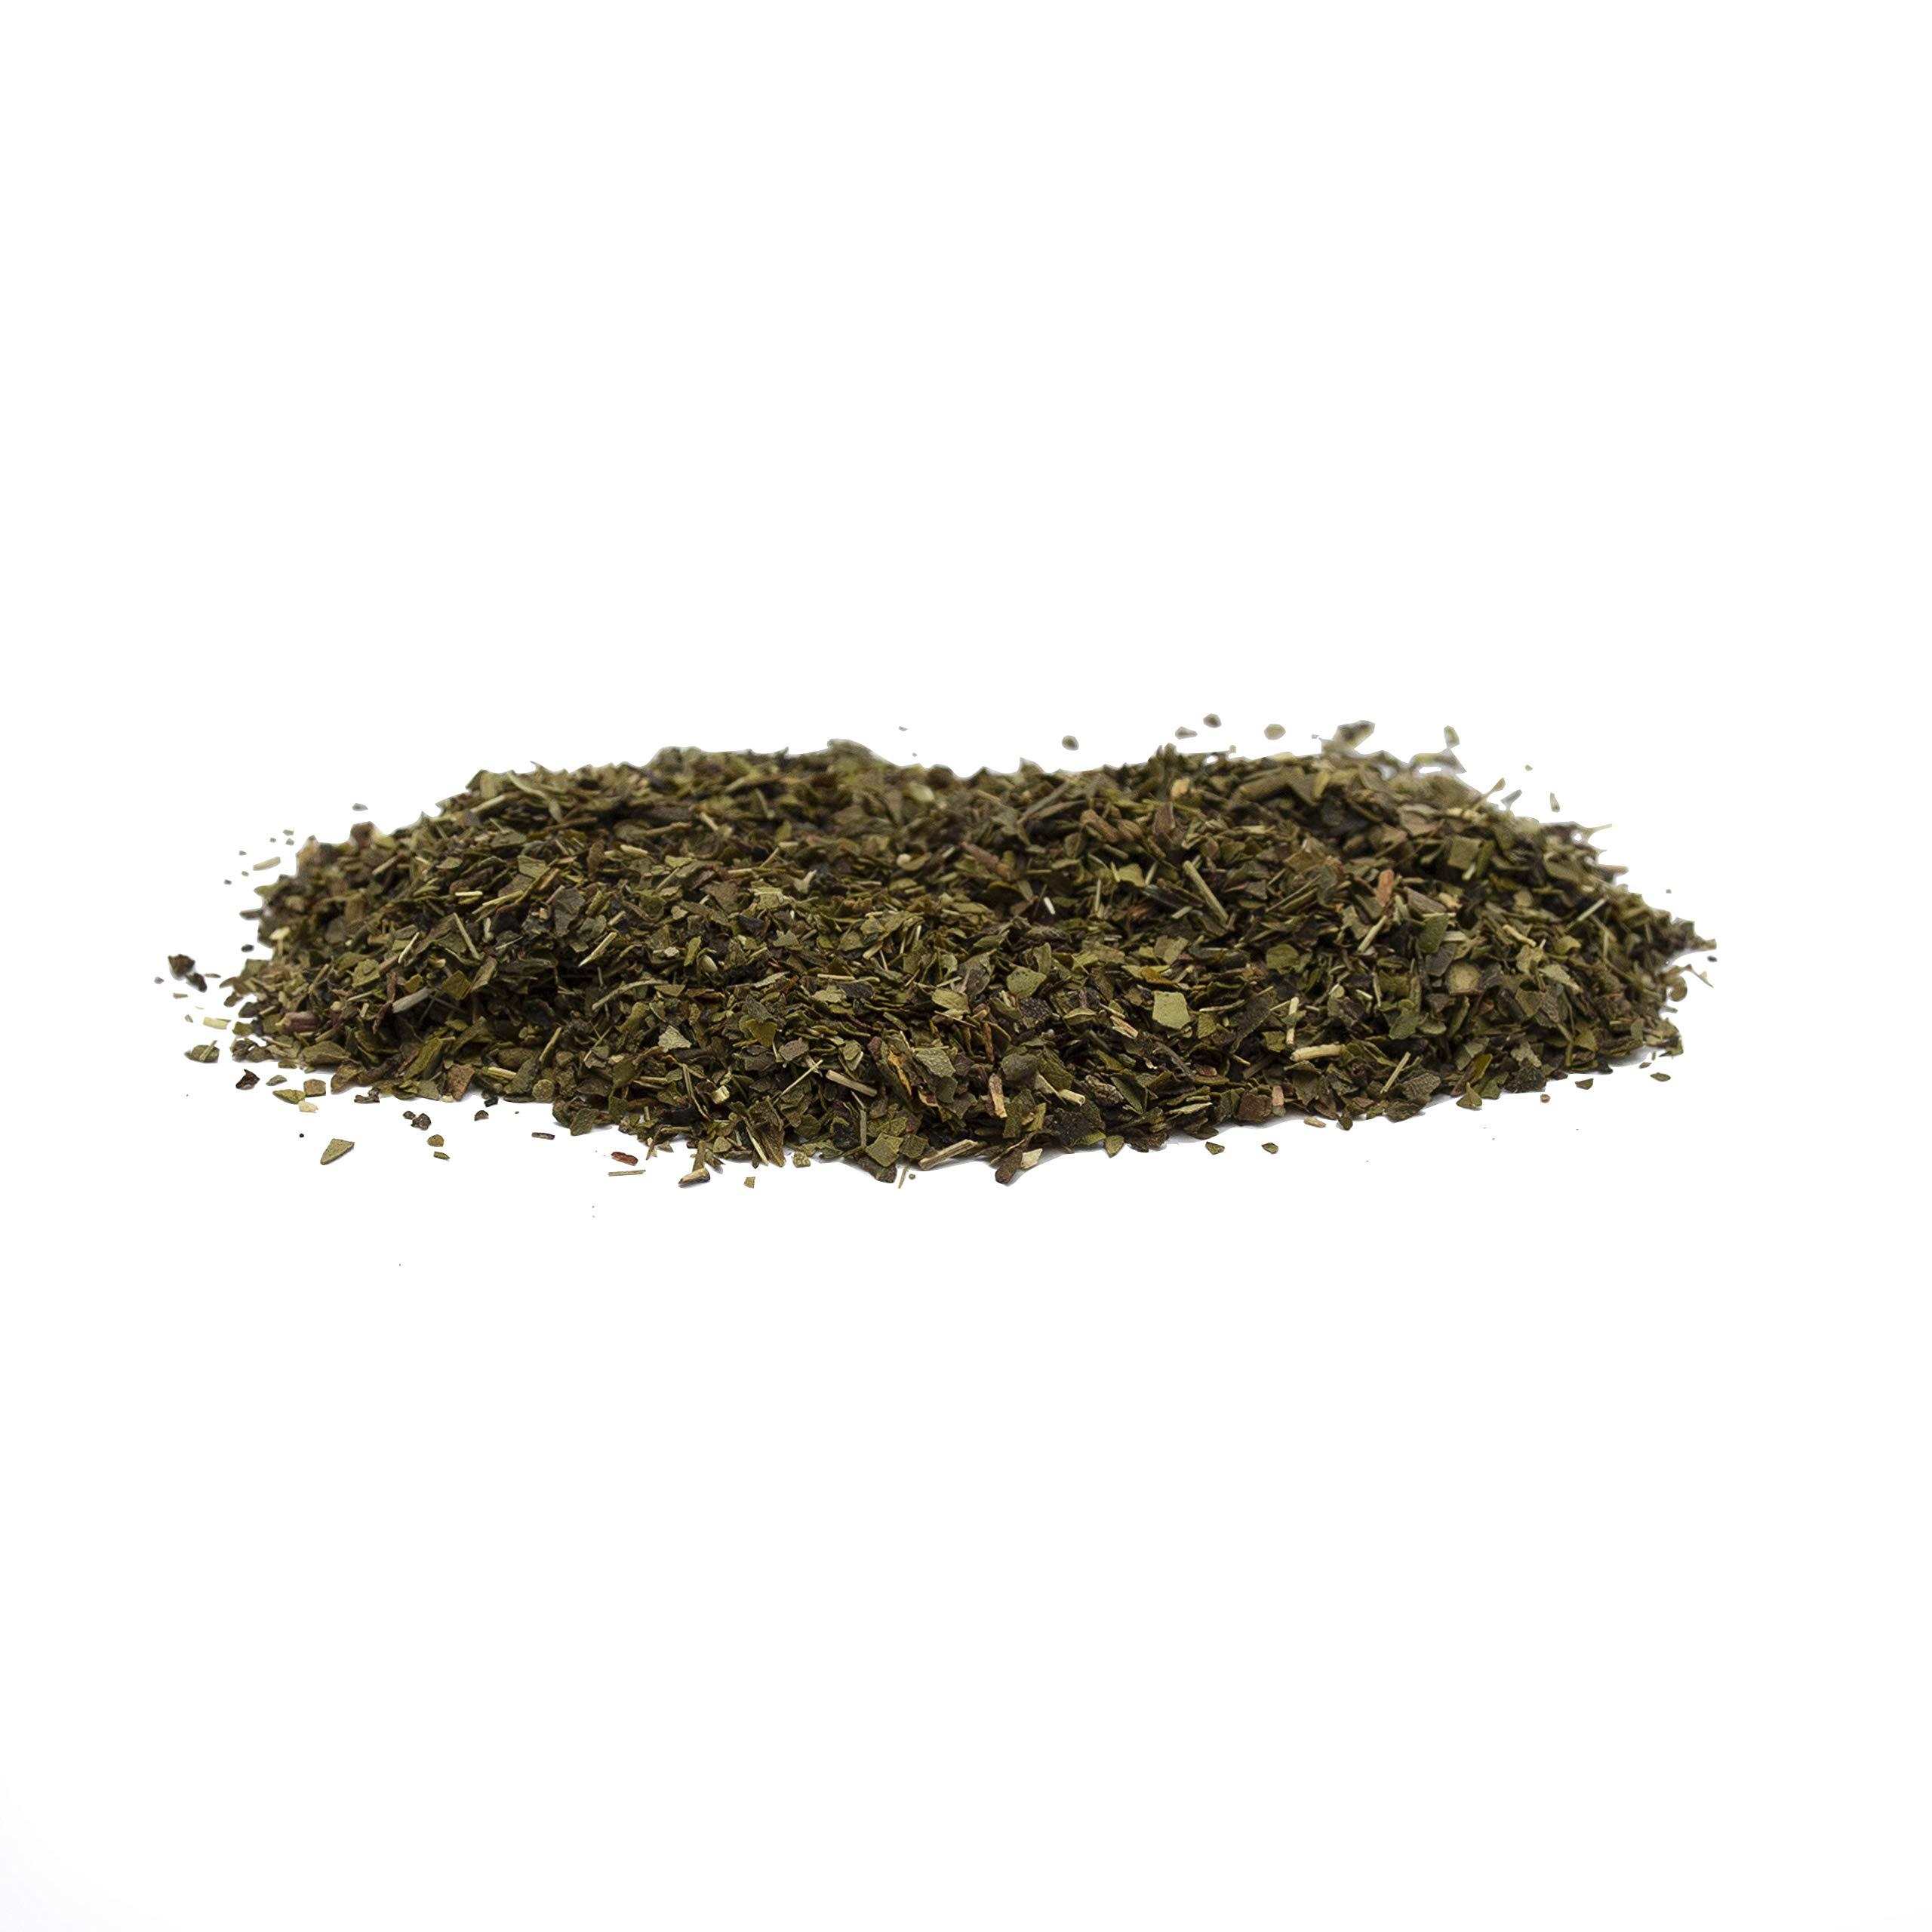 Tazo Zen Green Unsweetened Fresh Brewed Iced Tea Non GMO, 1 gallon, Pack of 24 by TAZO (Image #5)